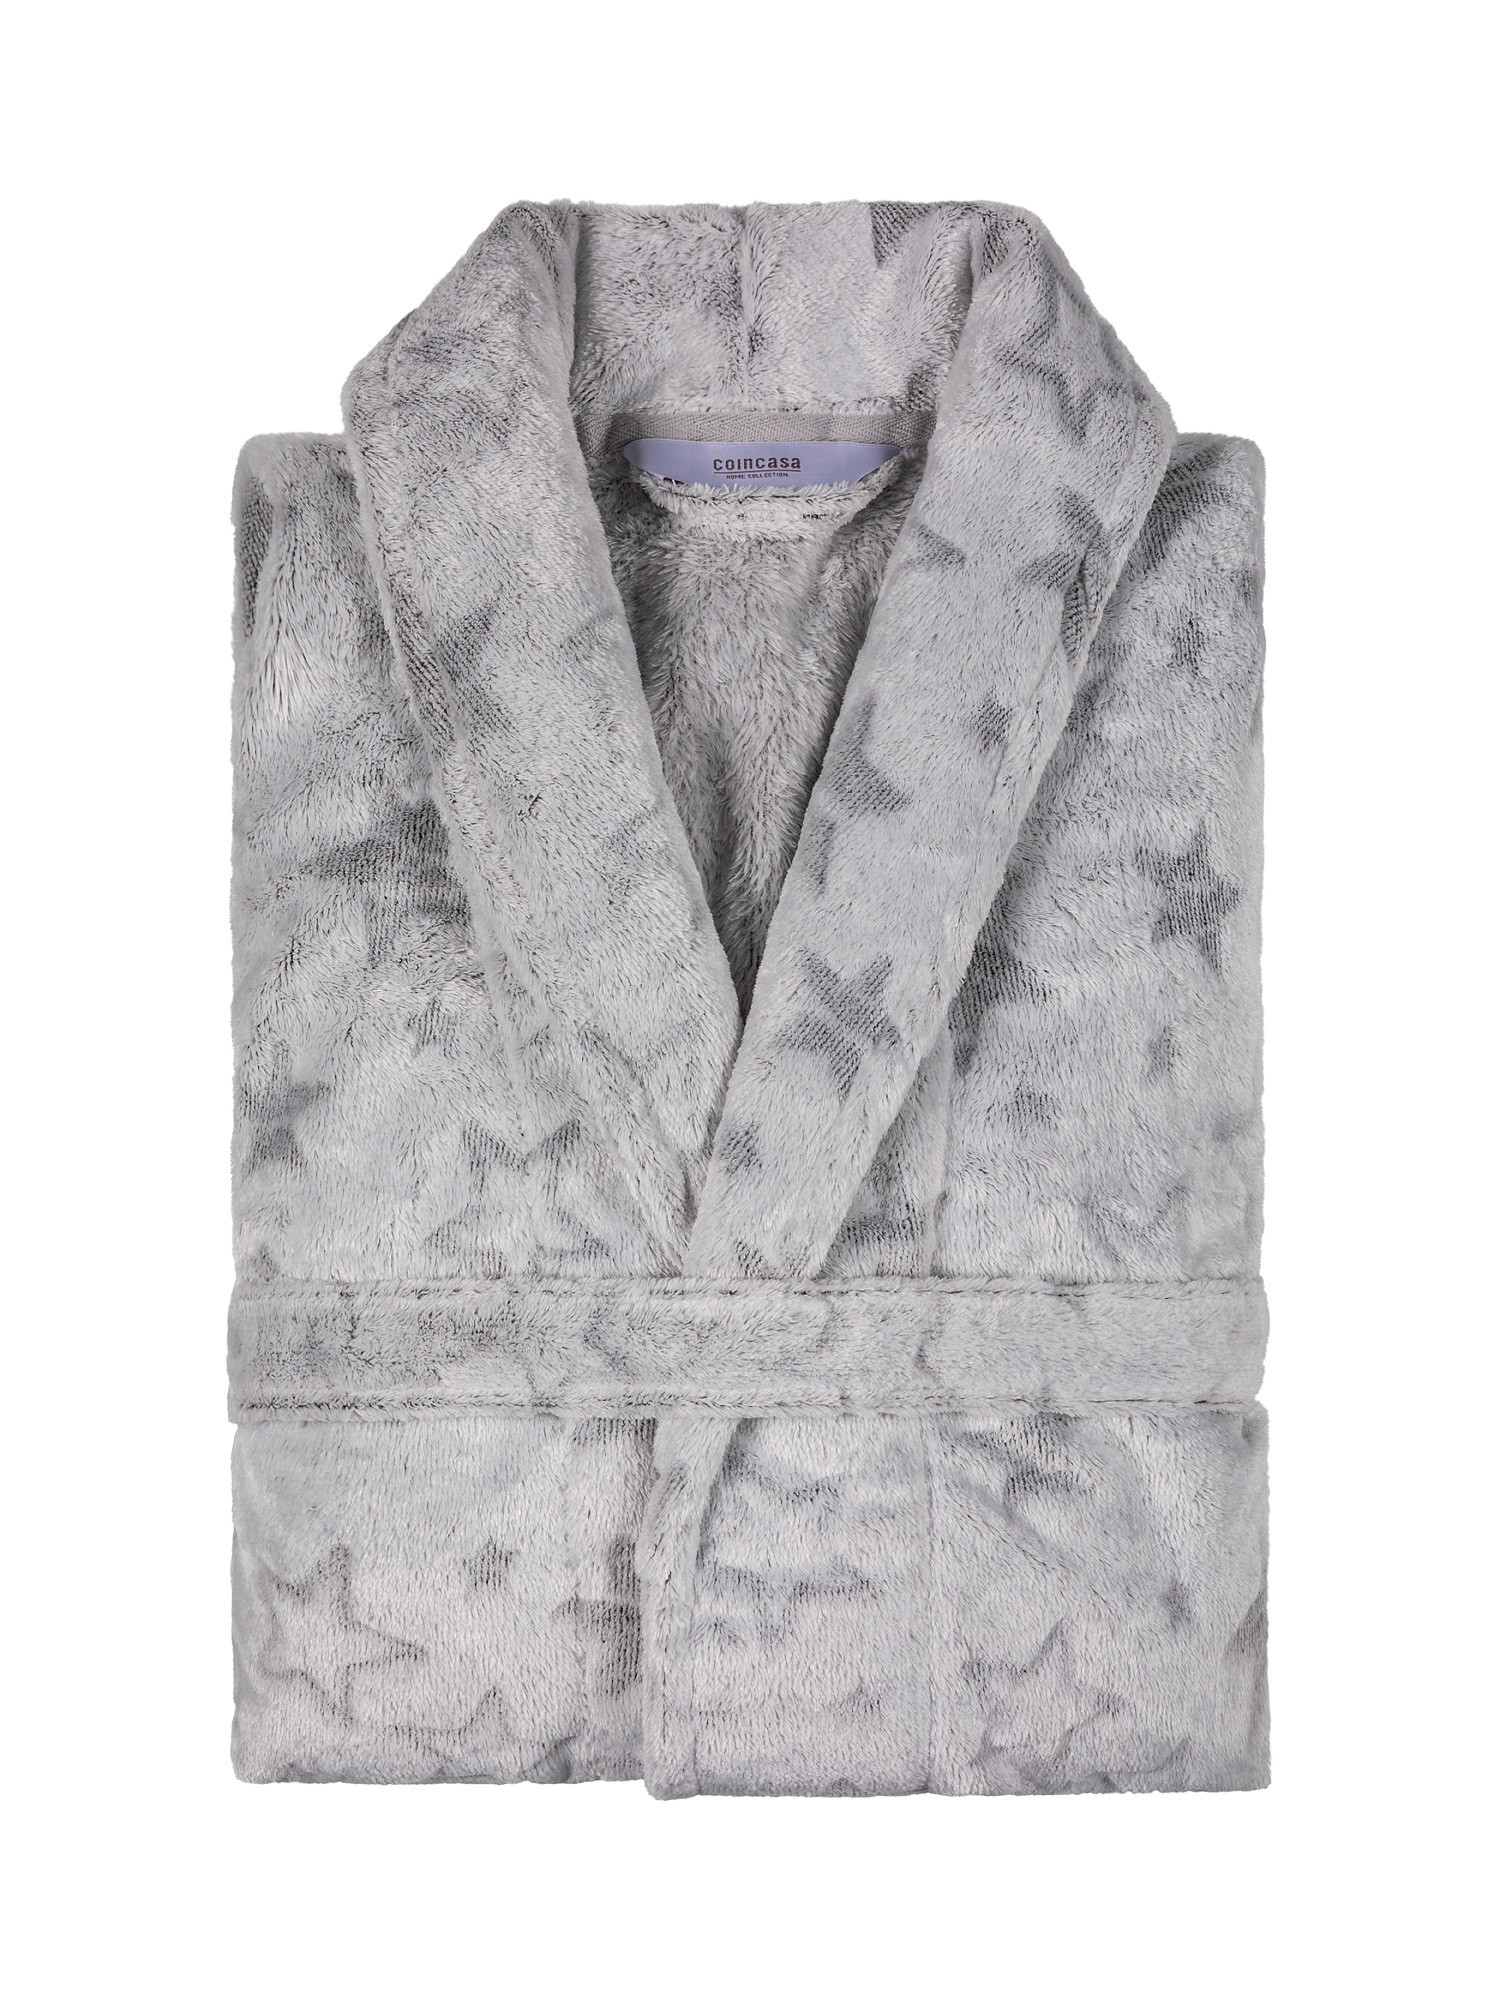 Vestaglia pile tinta unita, Bianco, large image number 1